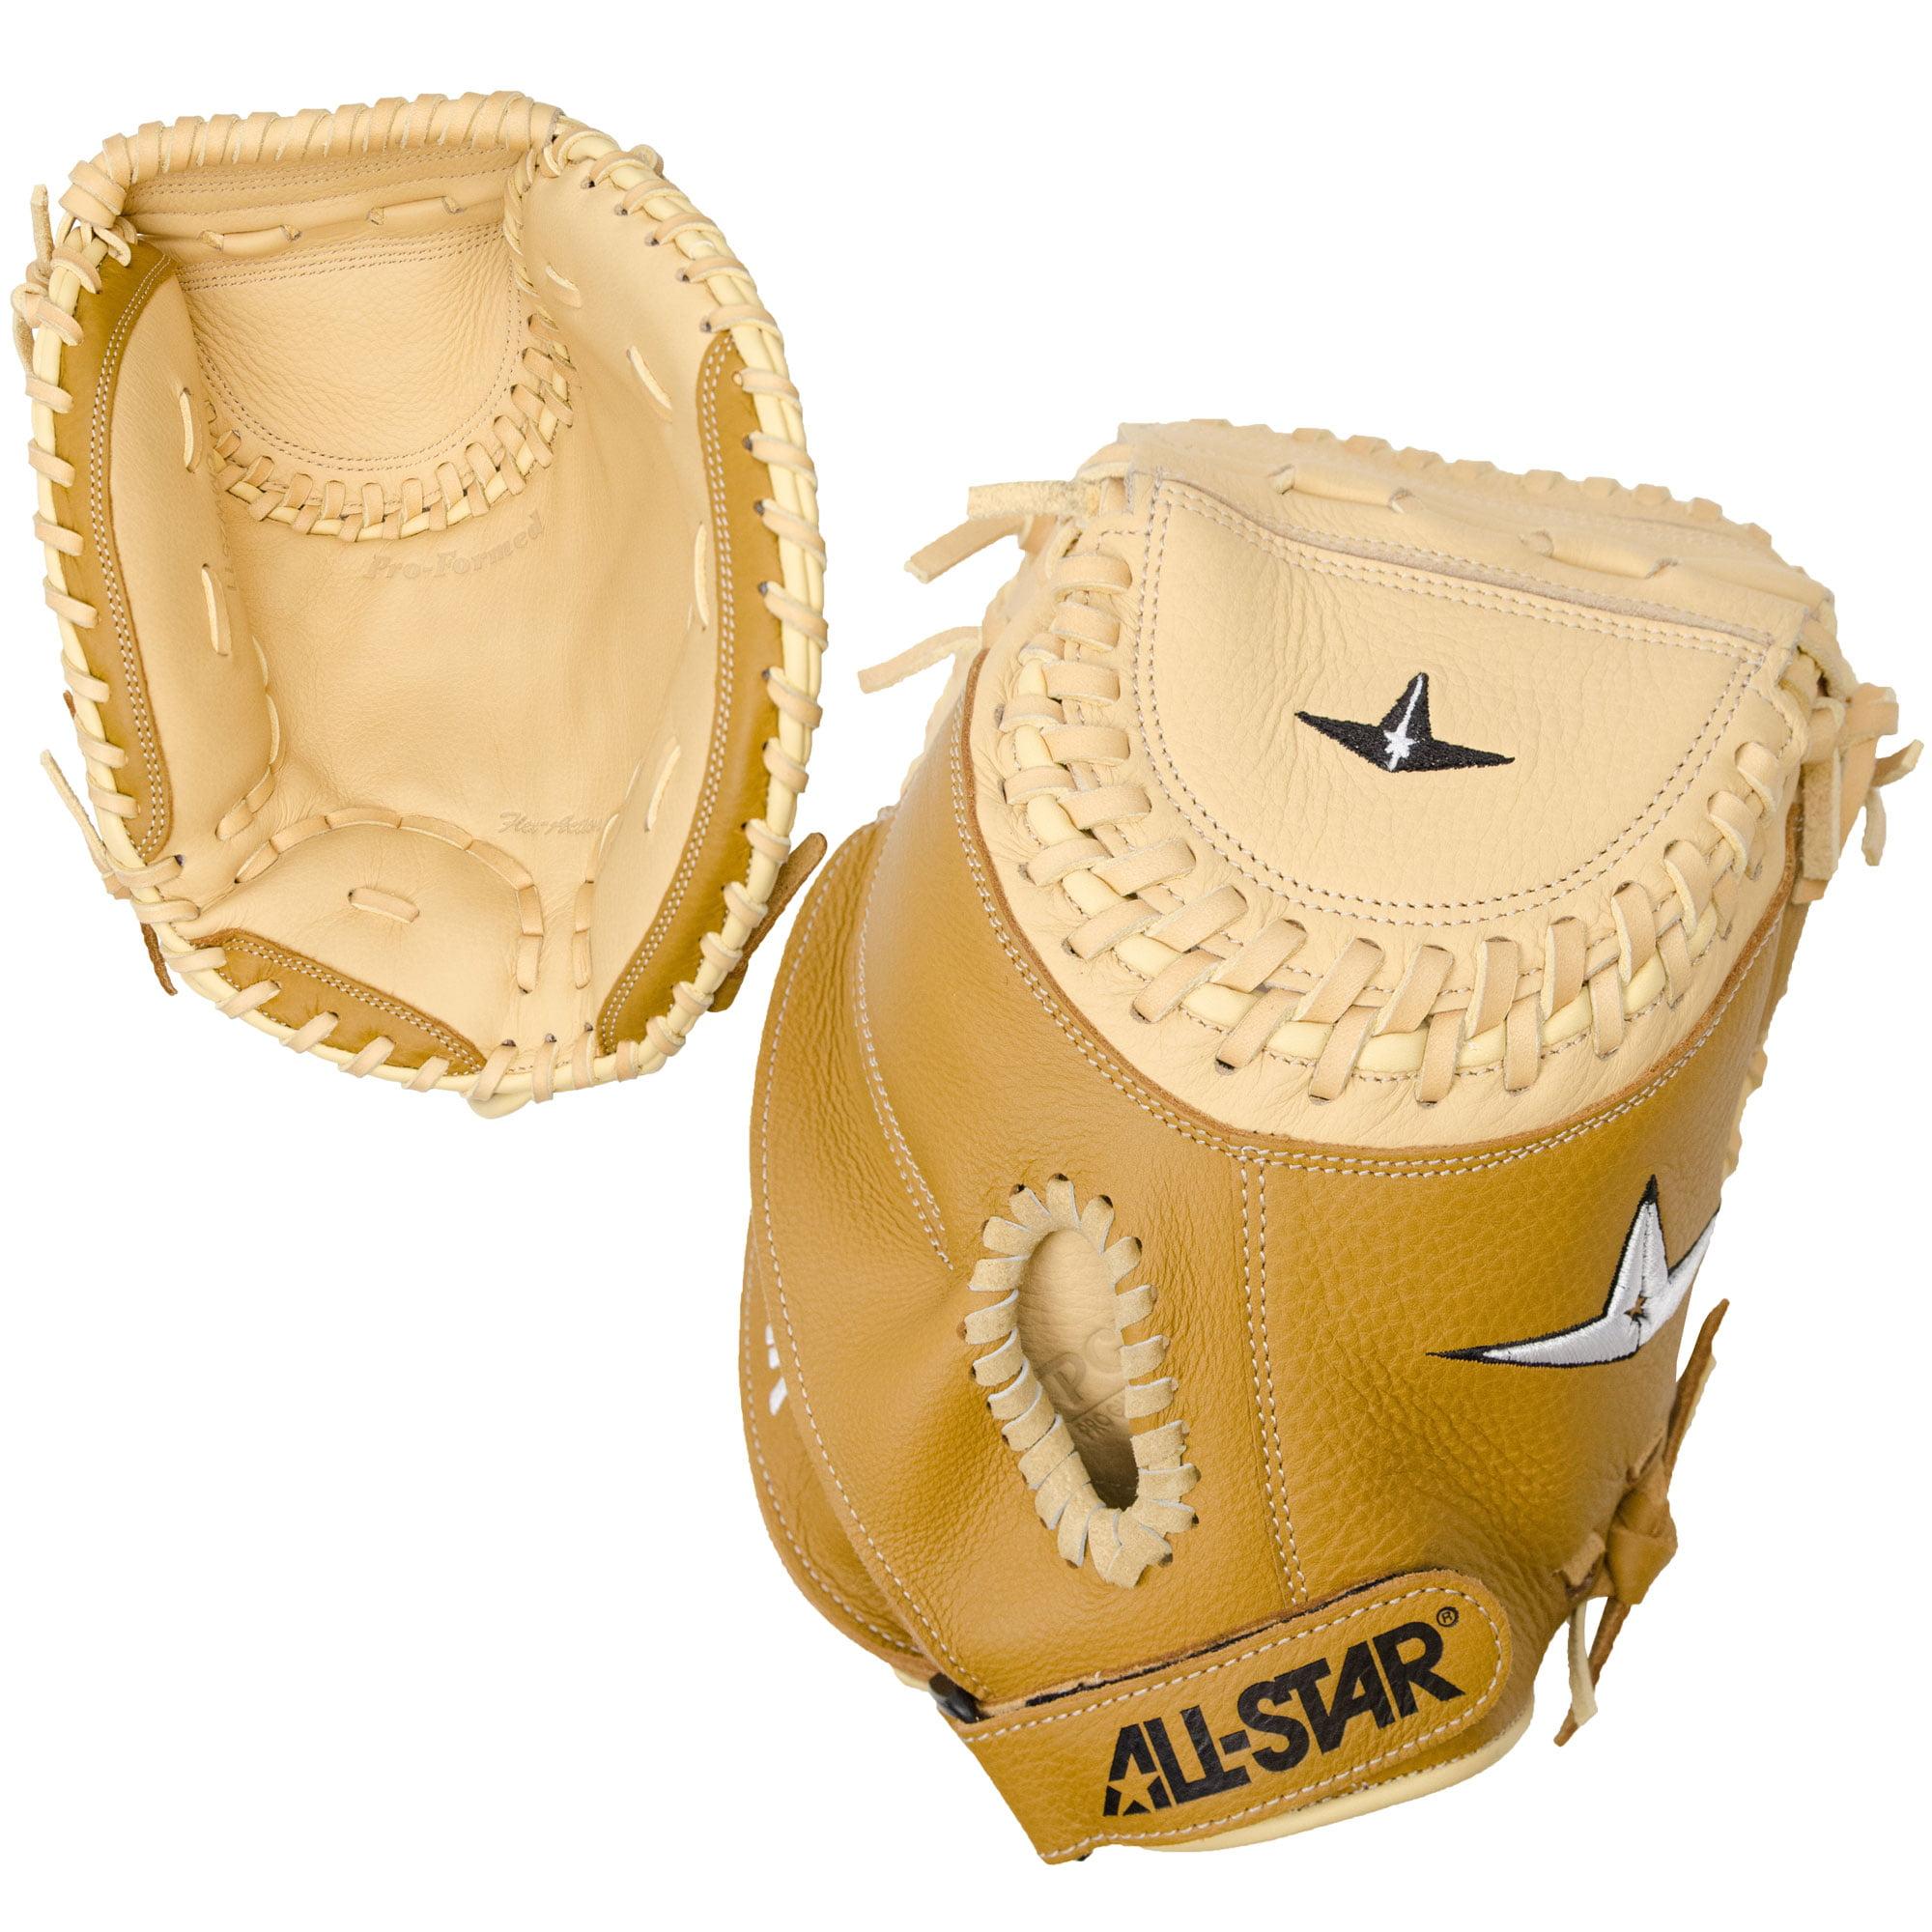 "All-Star 33.5/"" Adult Baseball Catcher/'s Mitt Throws Right /& Left"